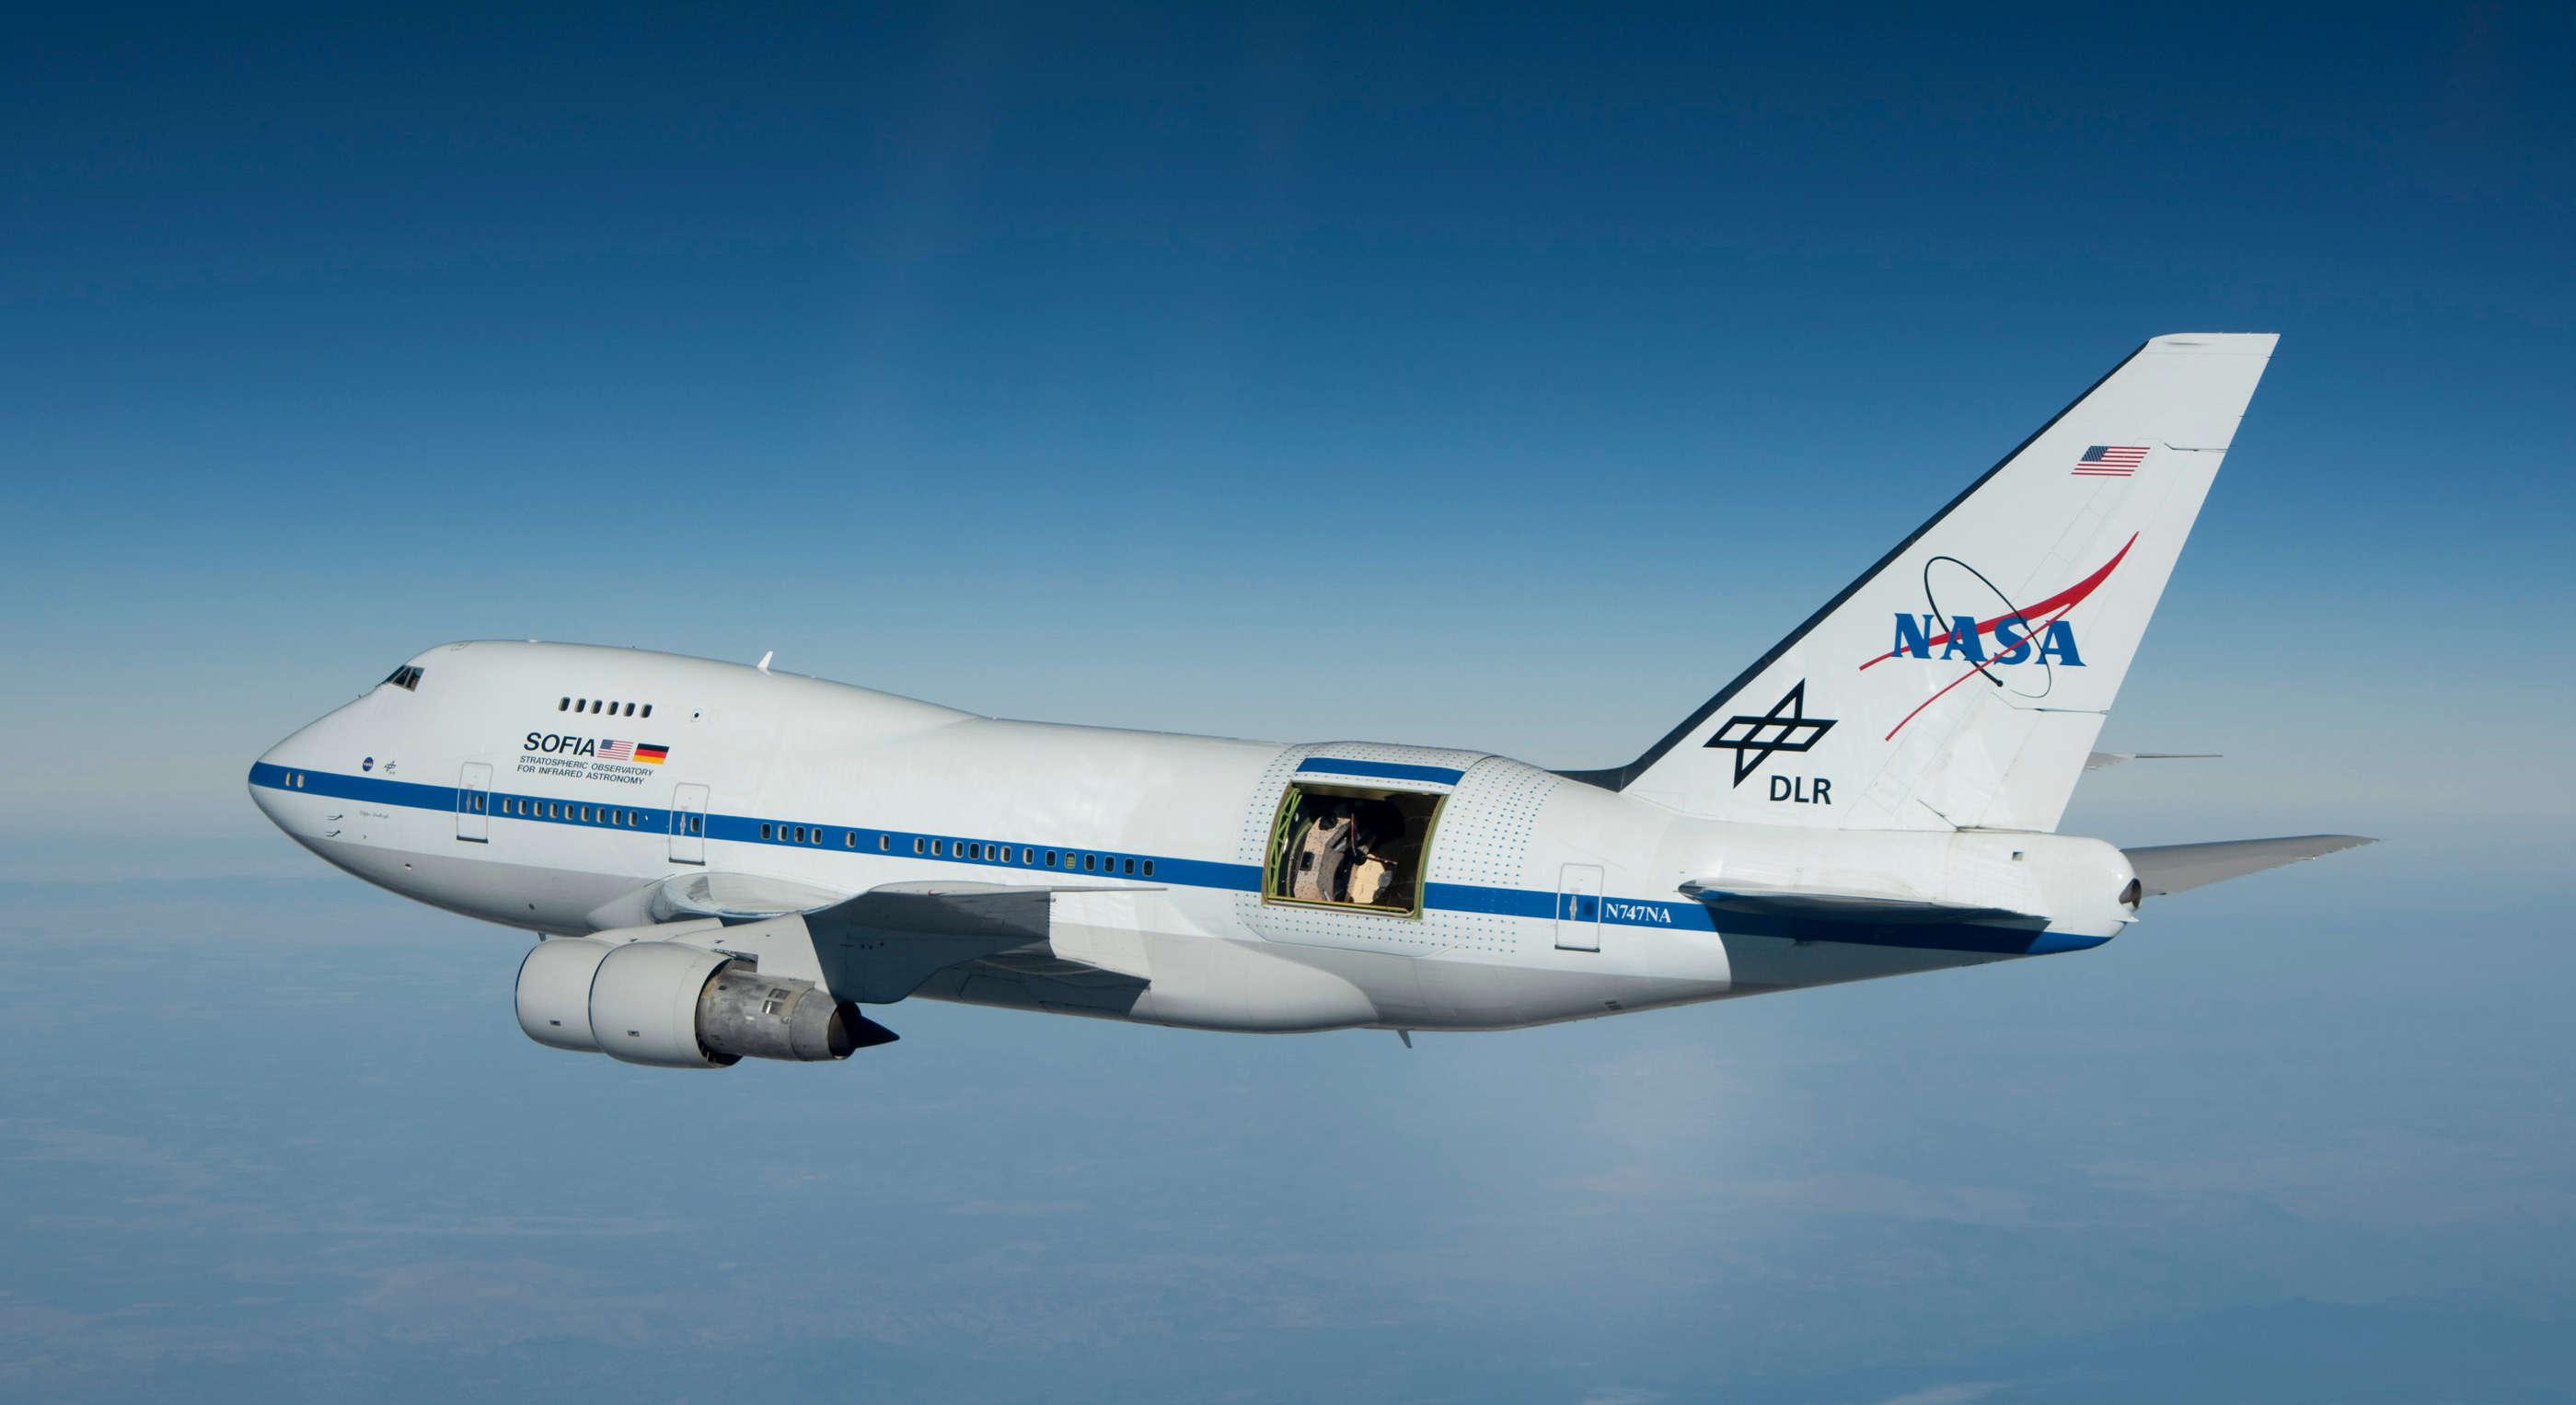 NASA/Jim Ross